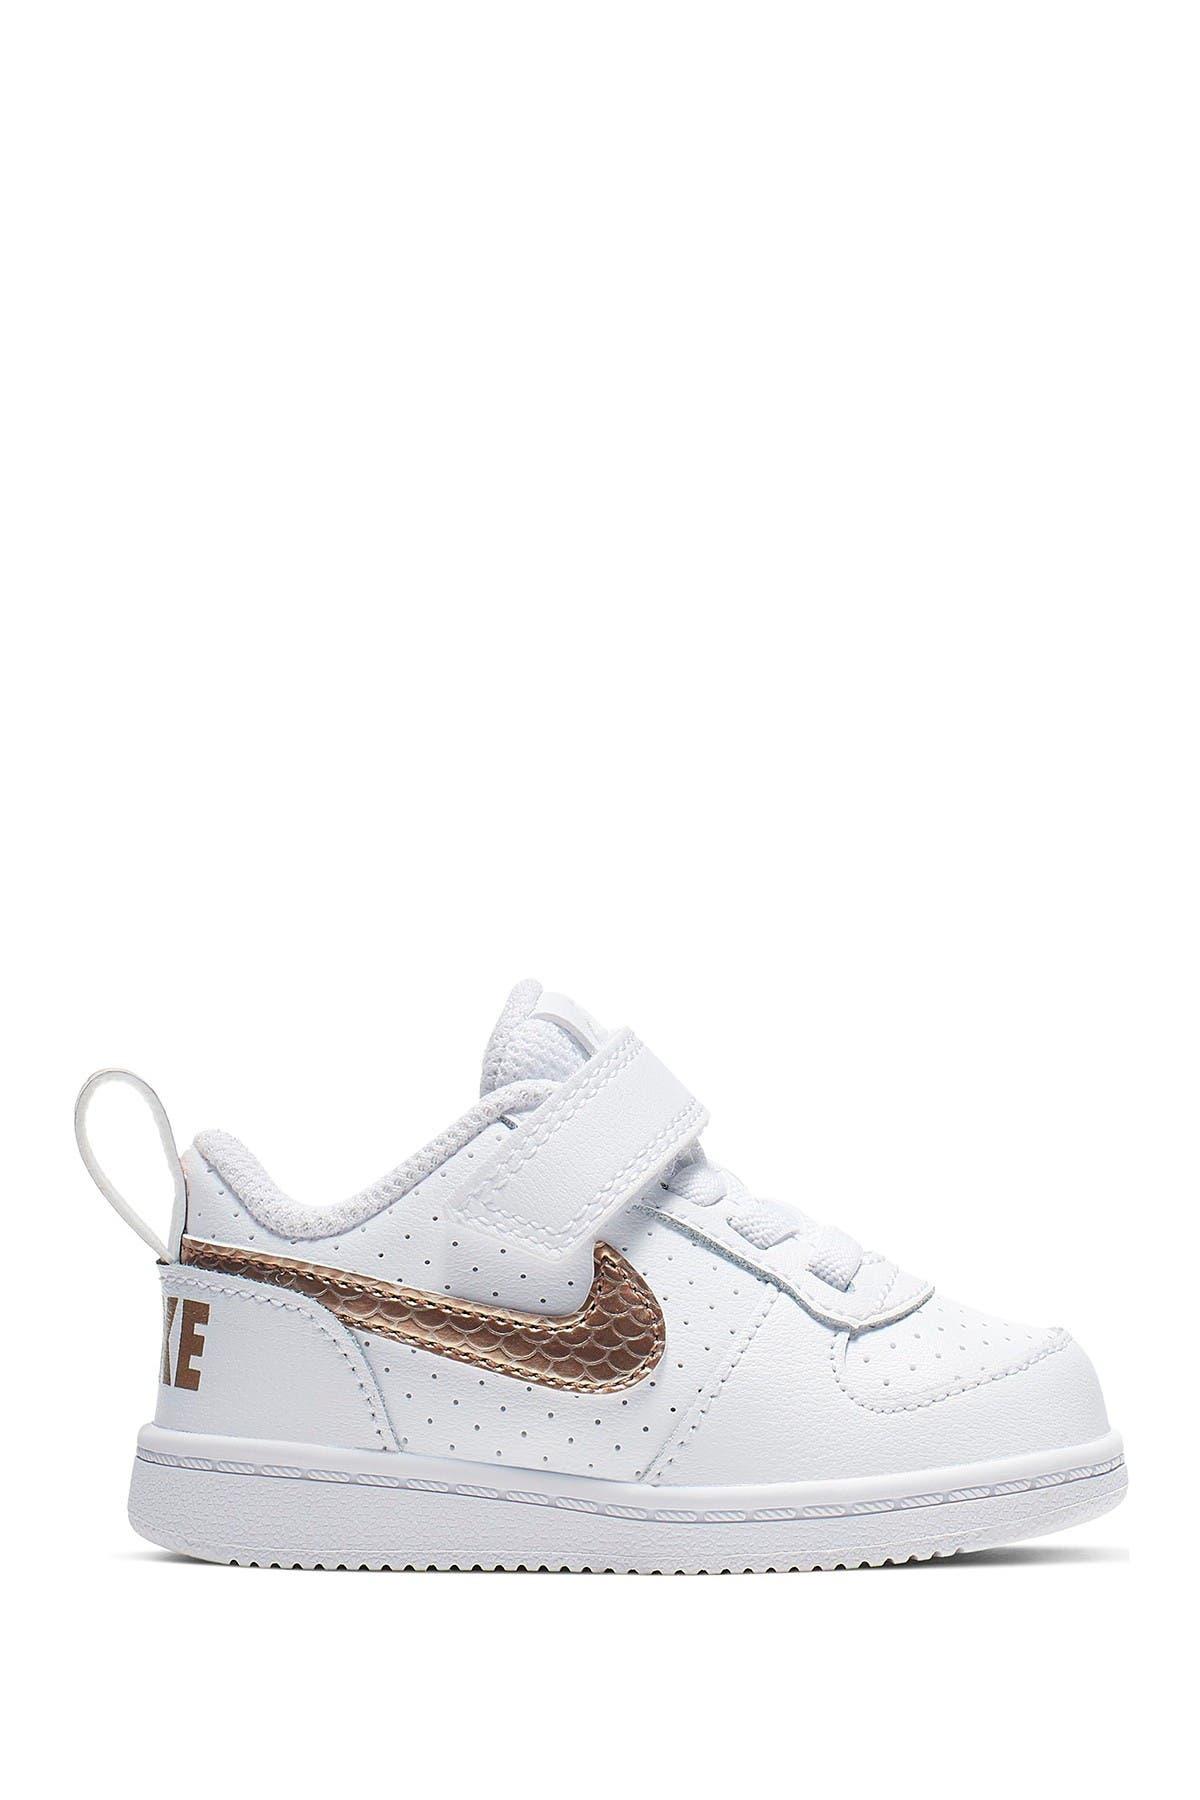 Nike | Court Borough Low EP Sneaker